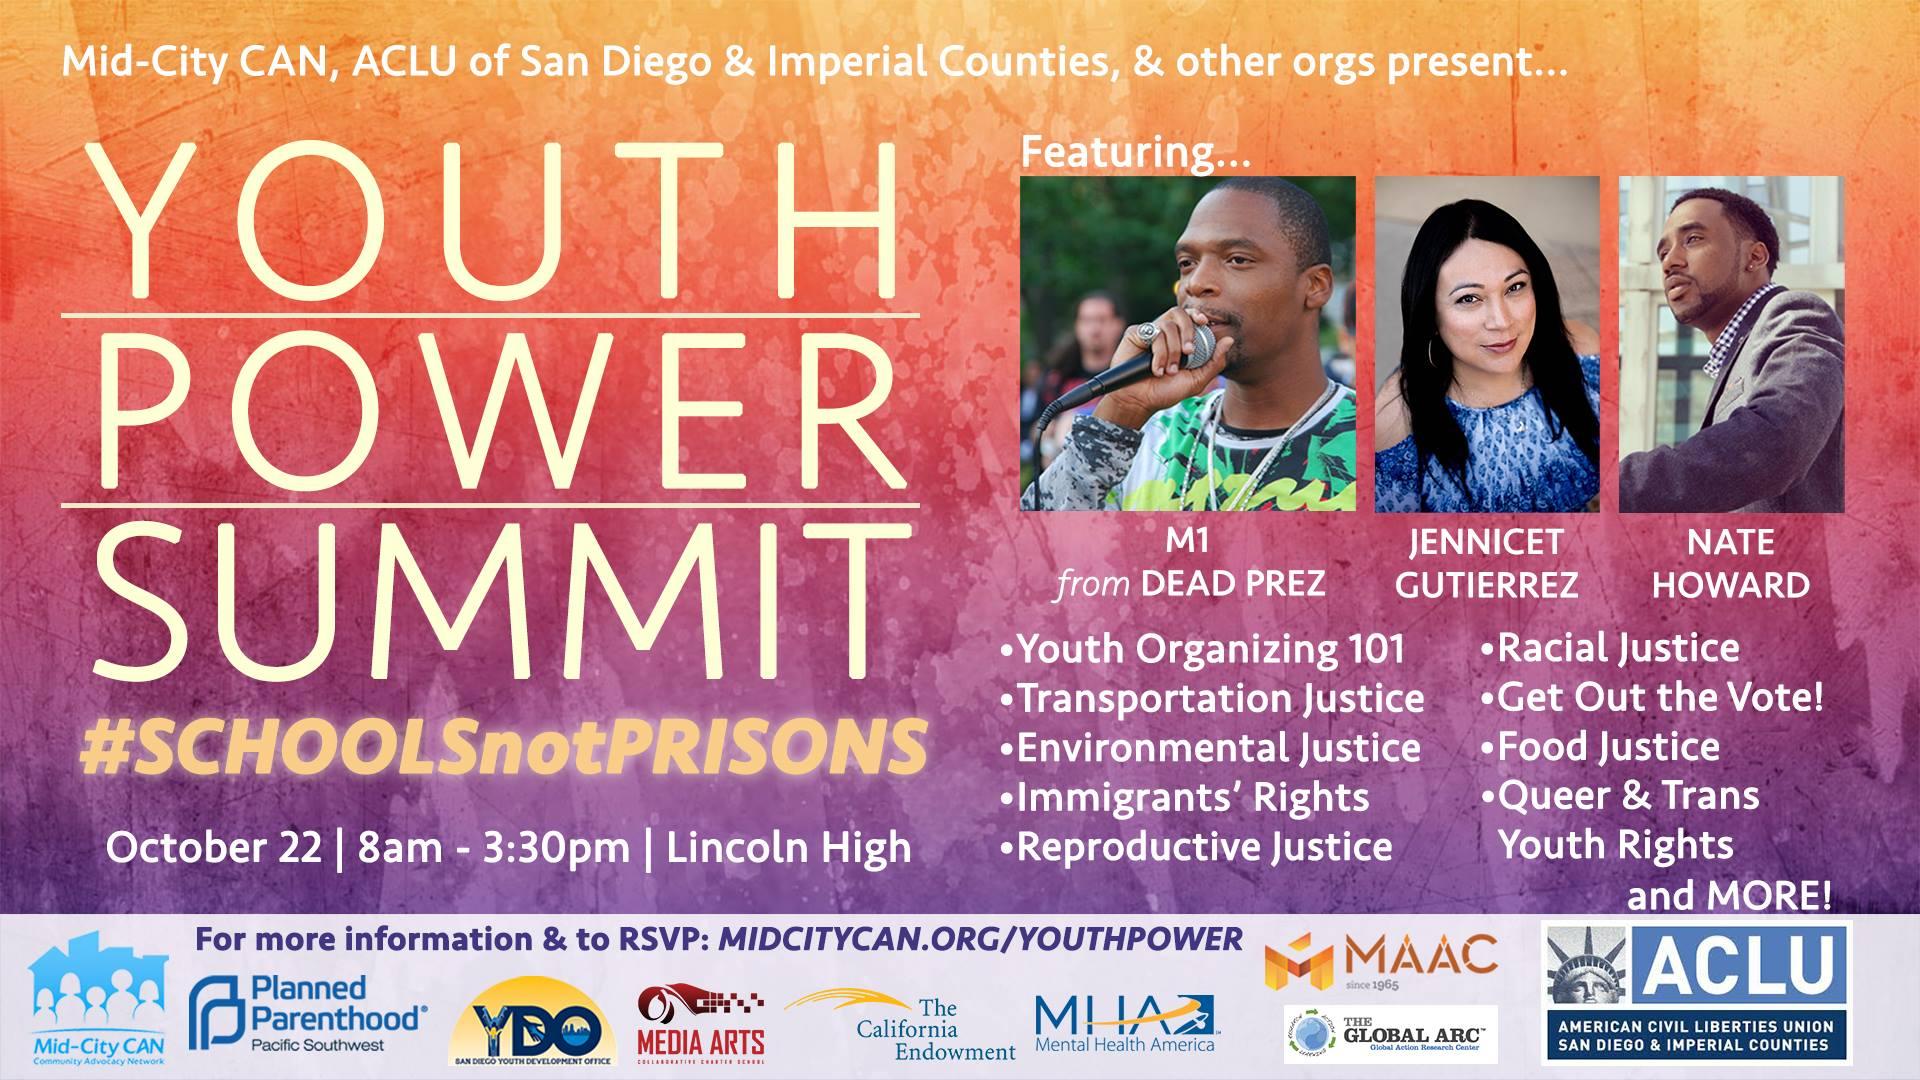 YouthPowerACLU.jpg